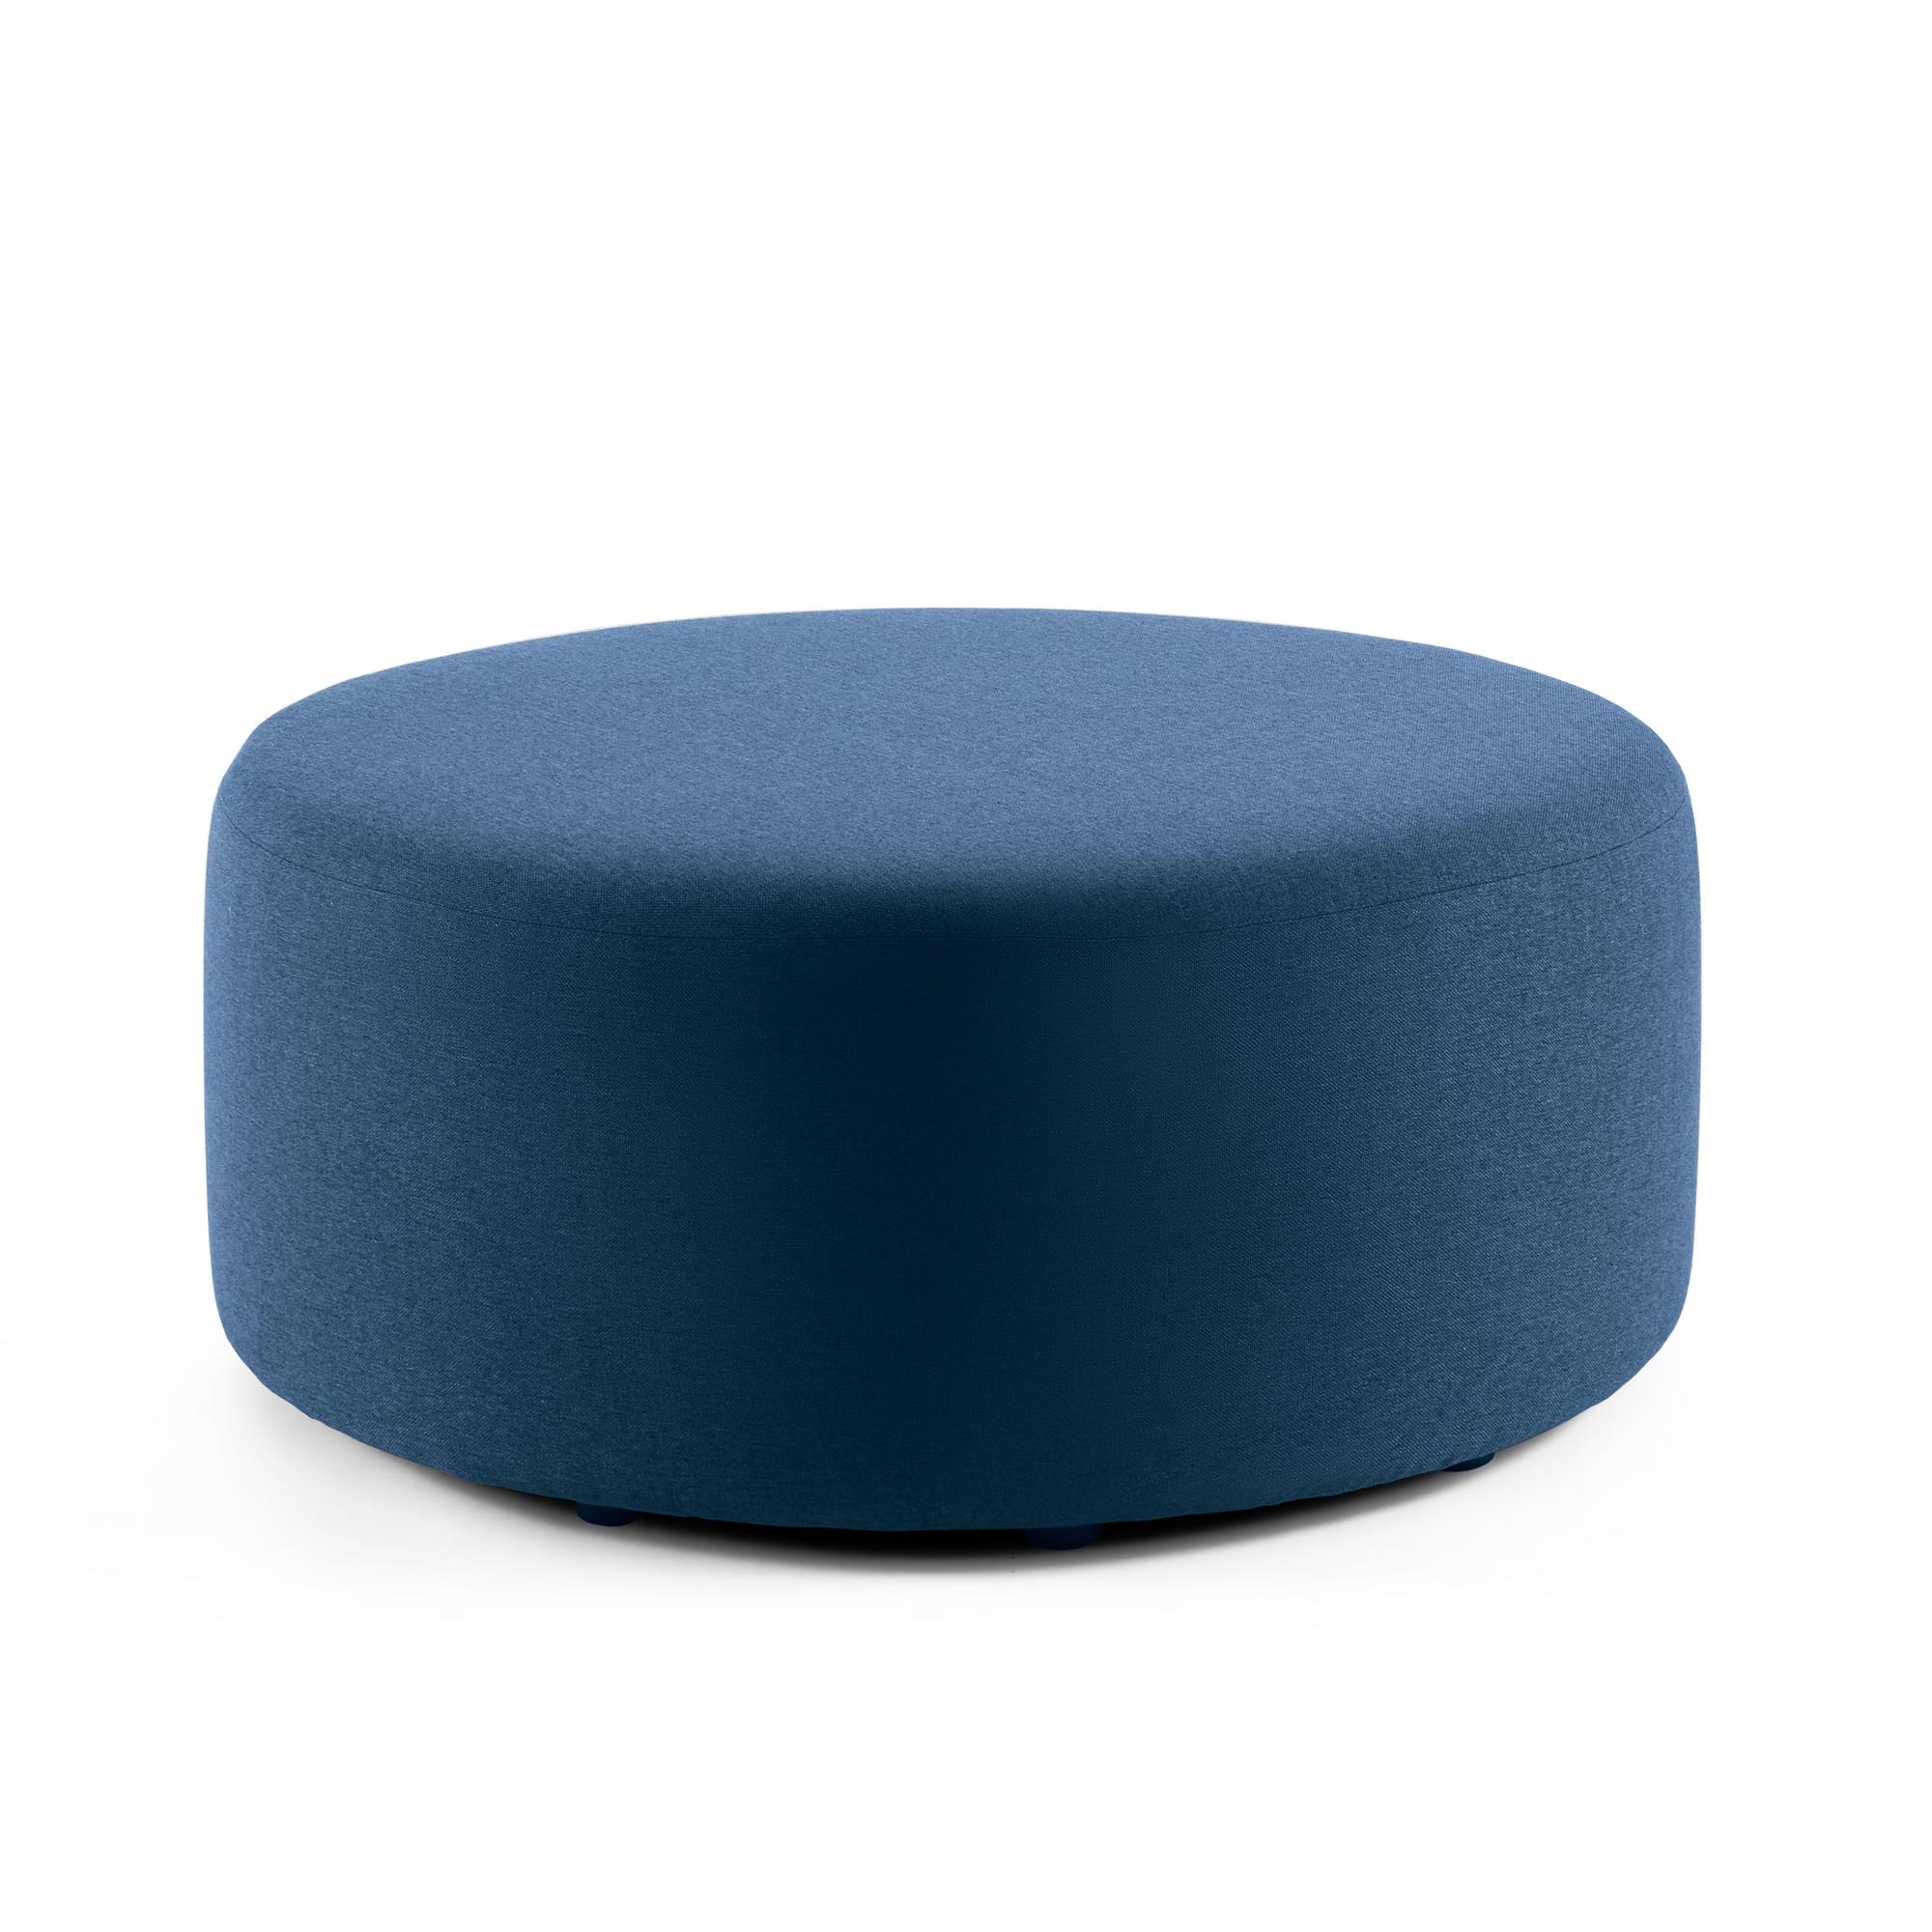 Dark Blue Block Party Lounge Round Ottoman 40 Office Furniture